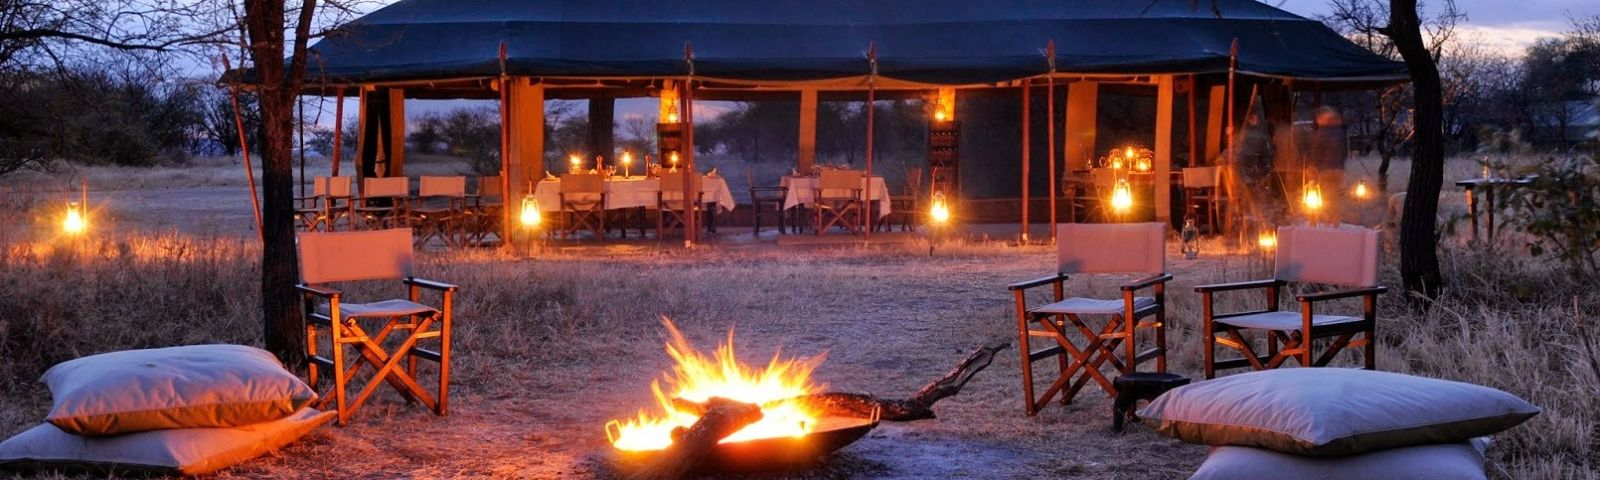 Lagerfeuer vor dem Safarizelt